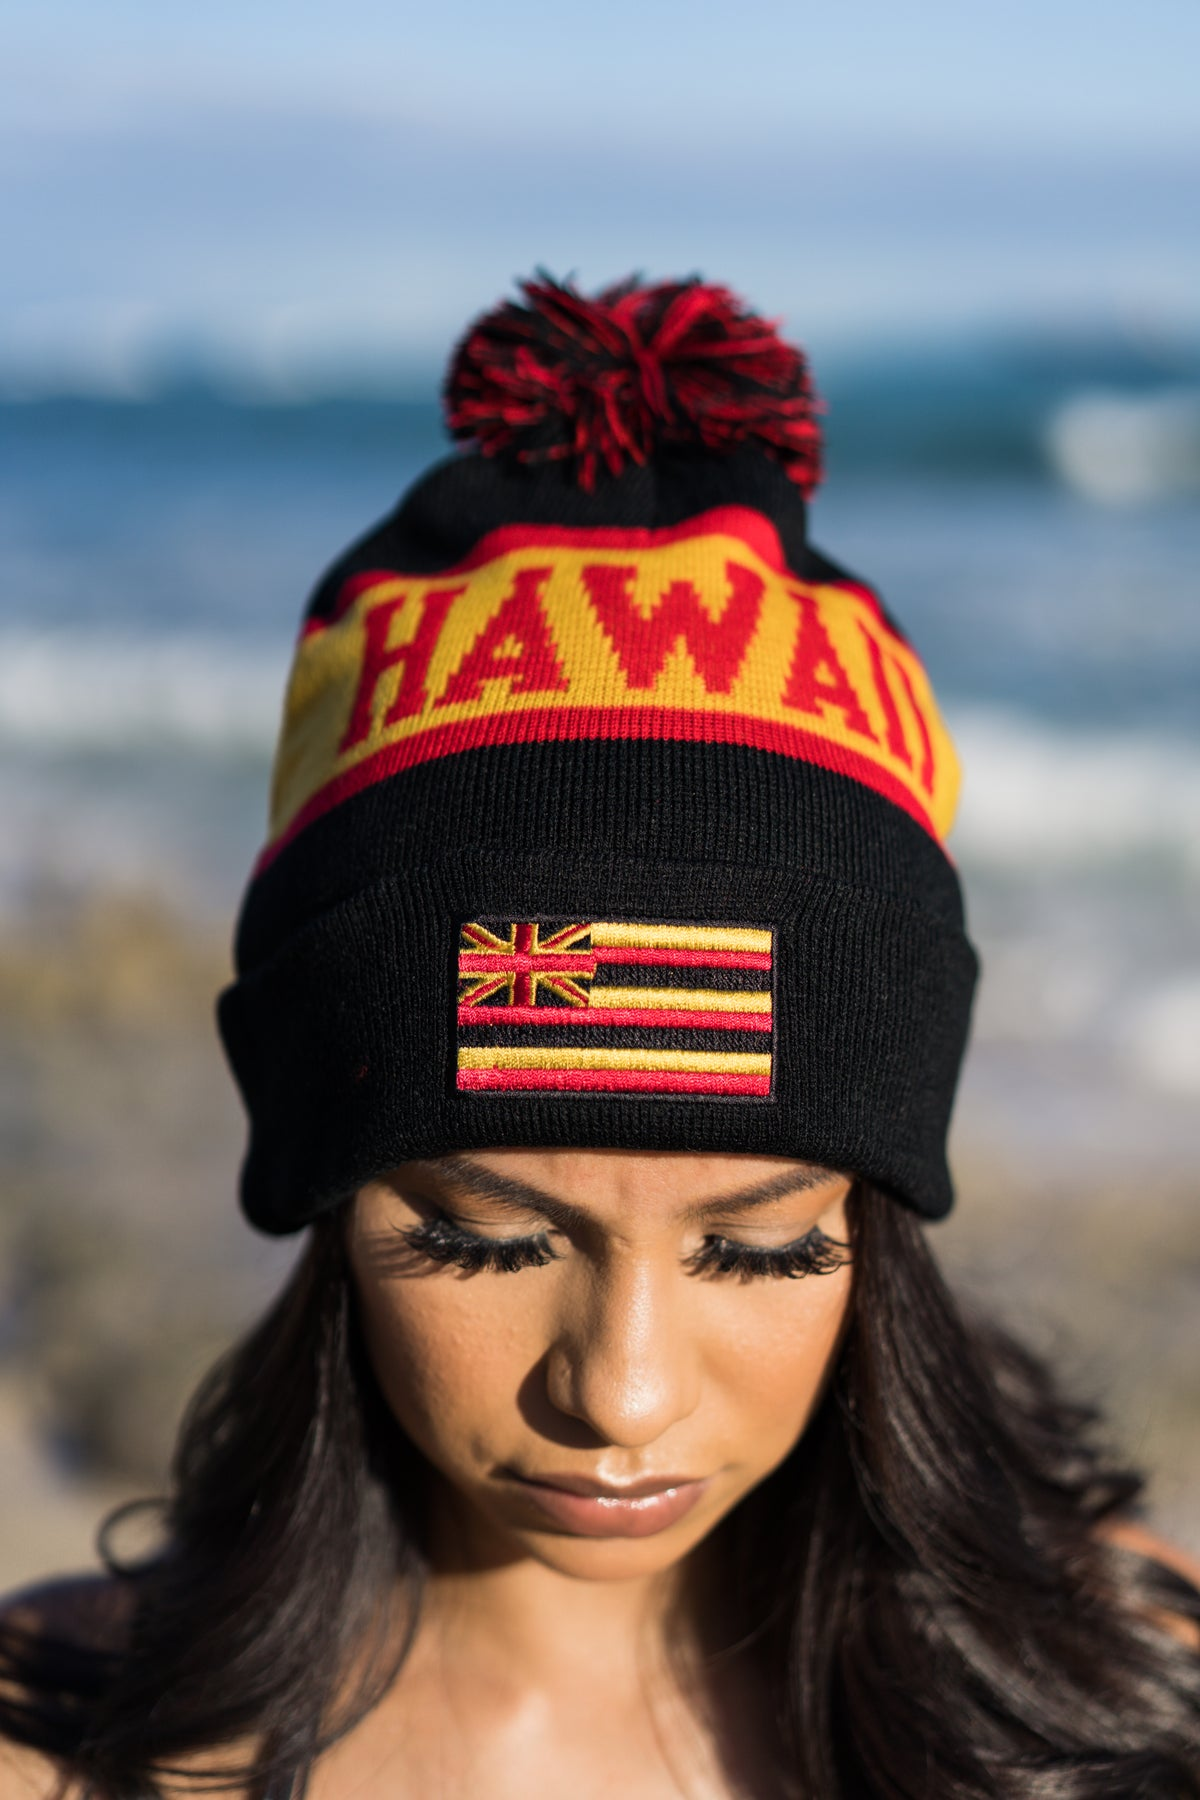 Delight Hawaii - Pom Beanie (Black/Red/Yellow)